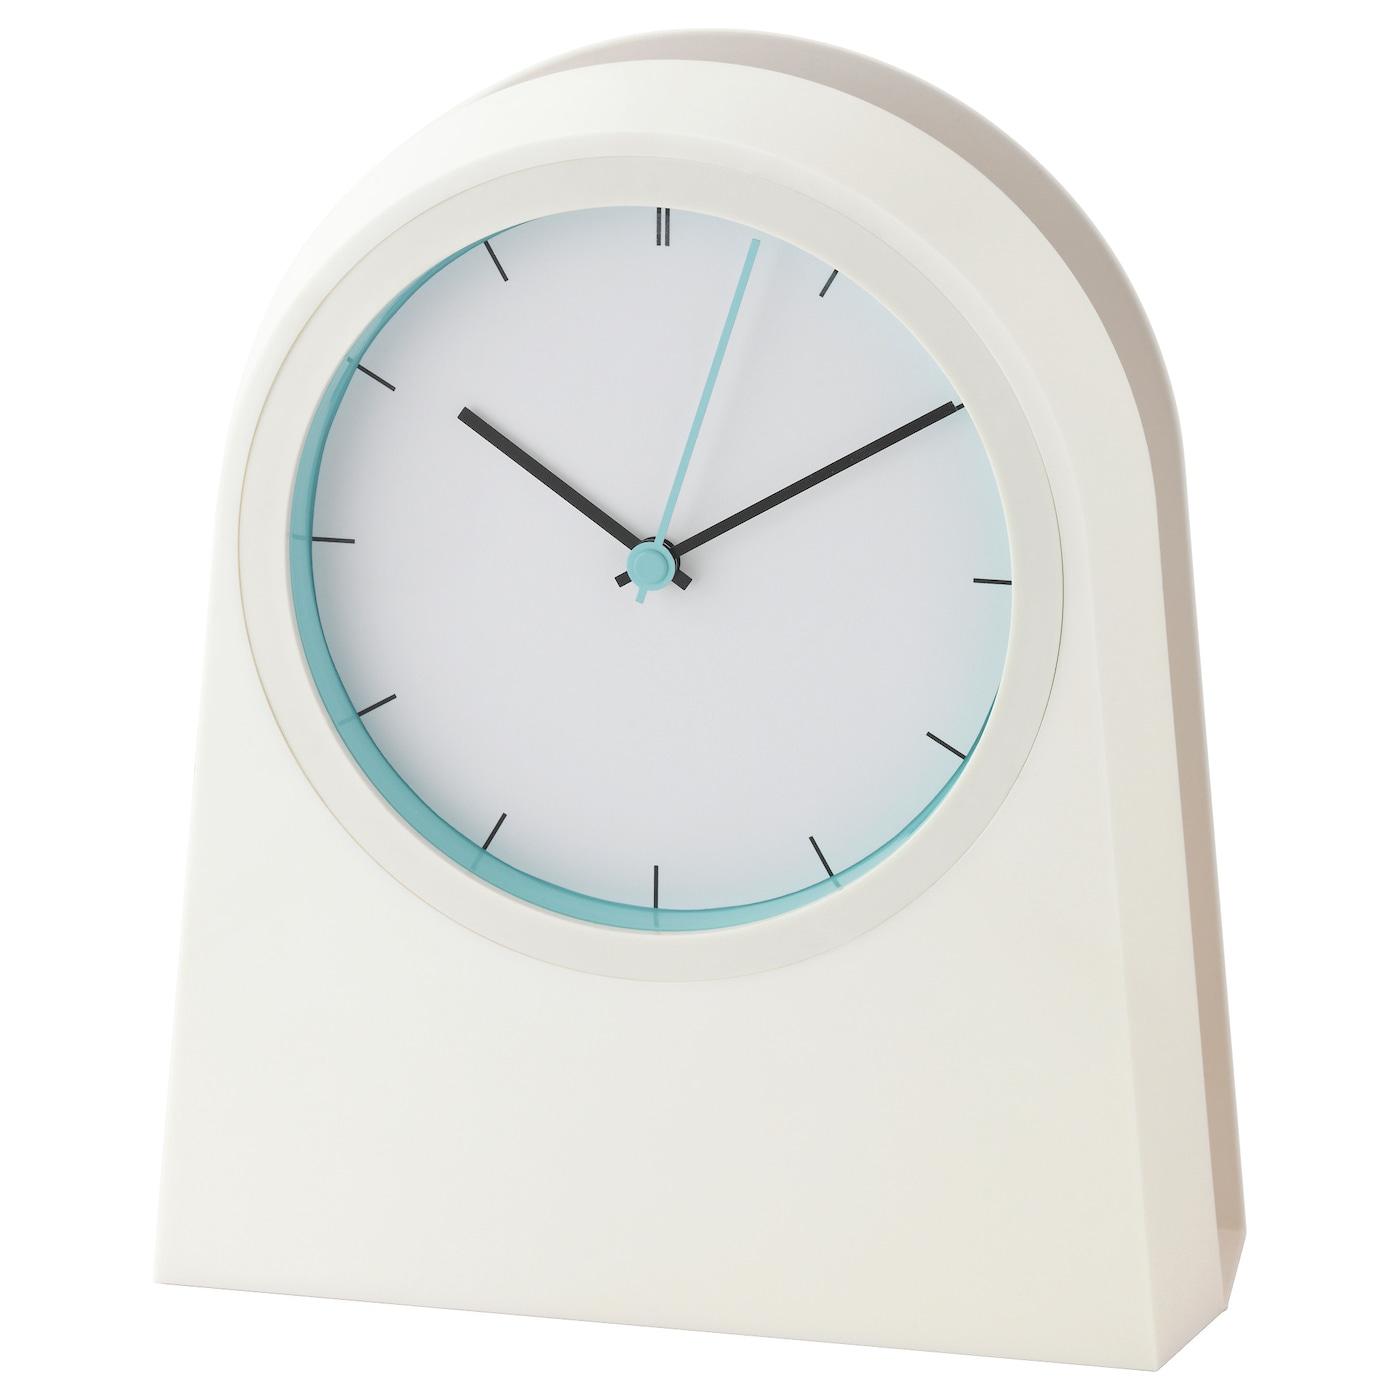 wall clocks kitchen clocks ikea ireland. Black Bedroom Furniture Sets. Home Design Ideas